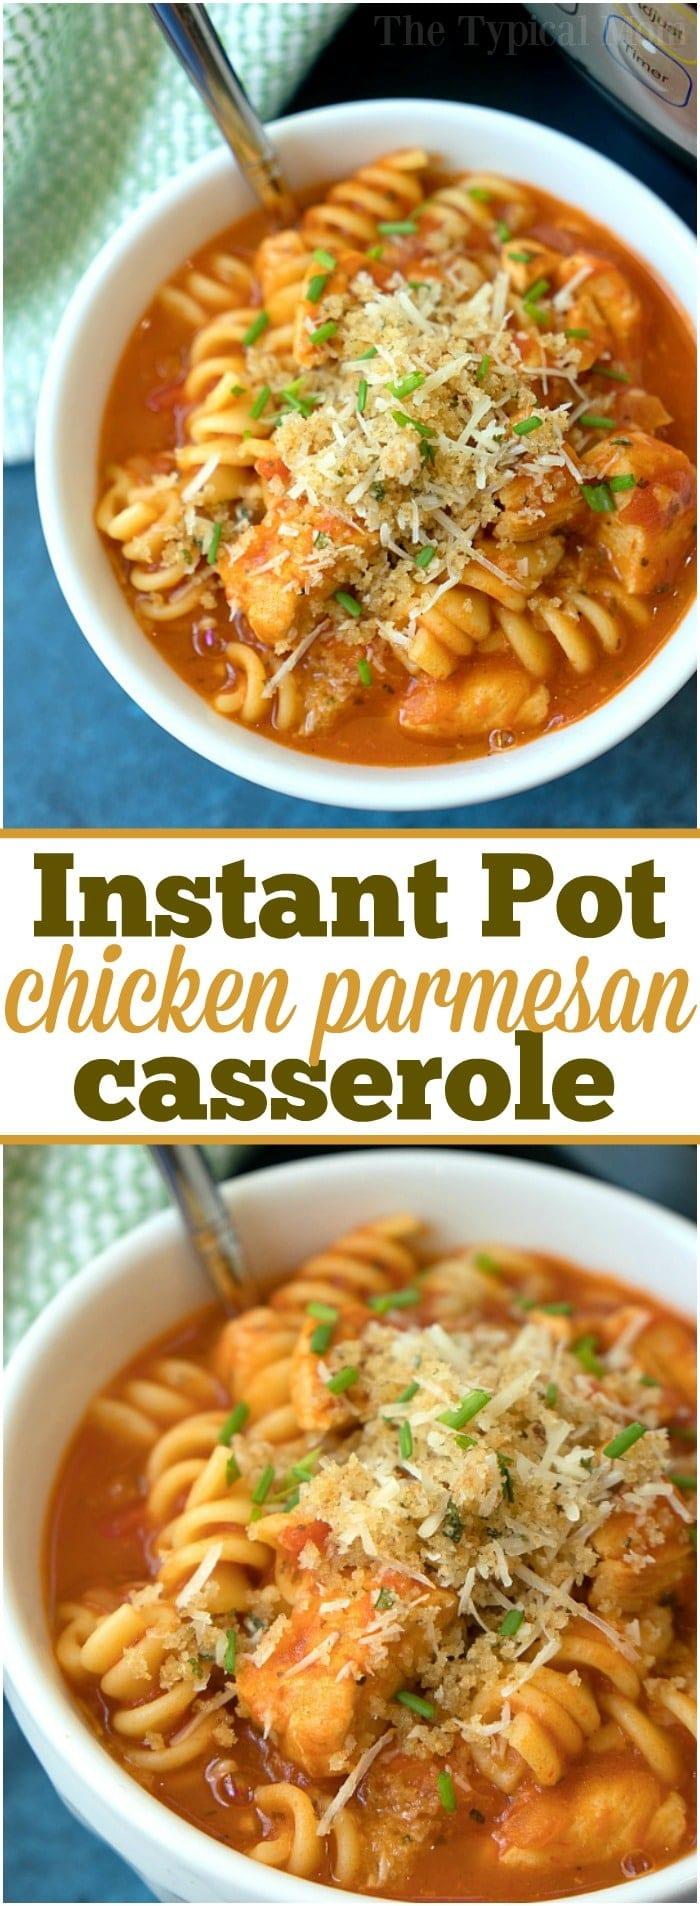 instant pot chicken parmesan casserole 3